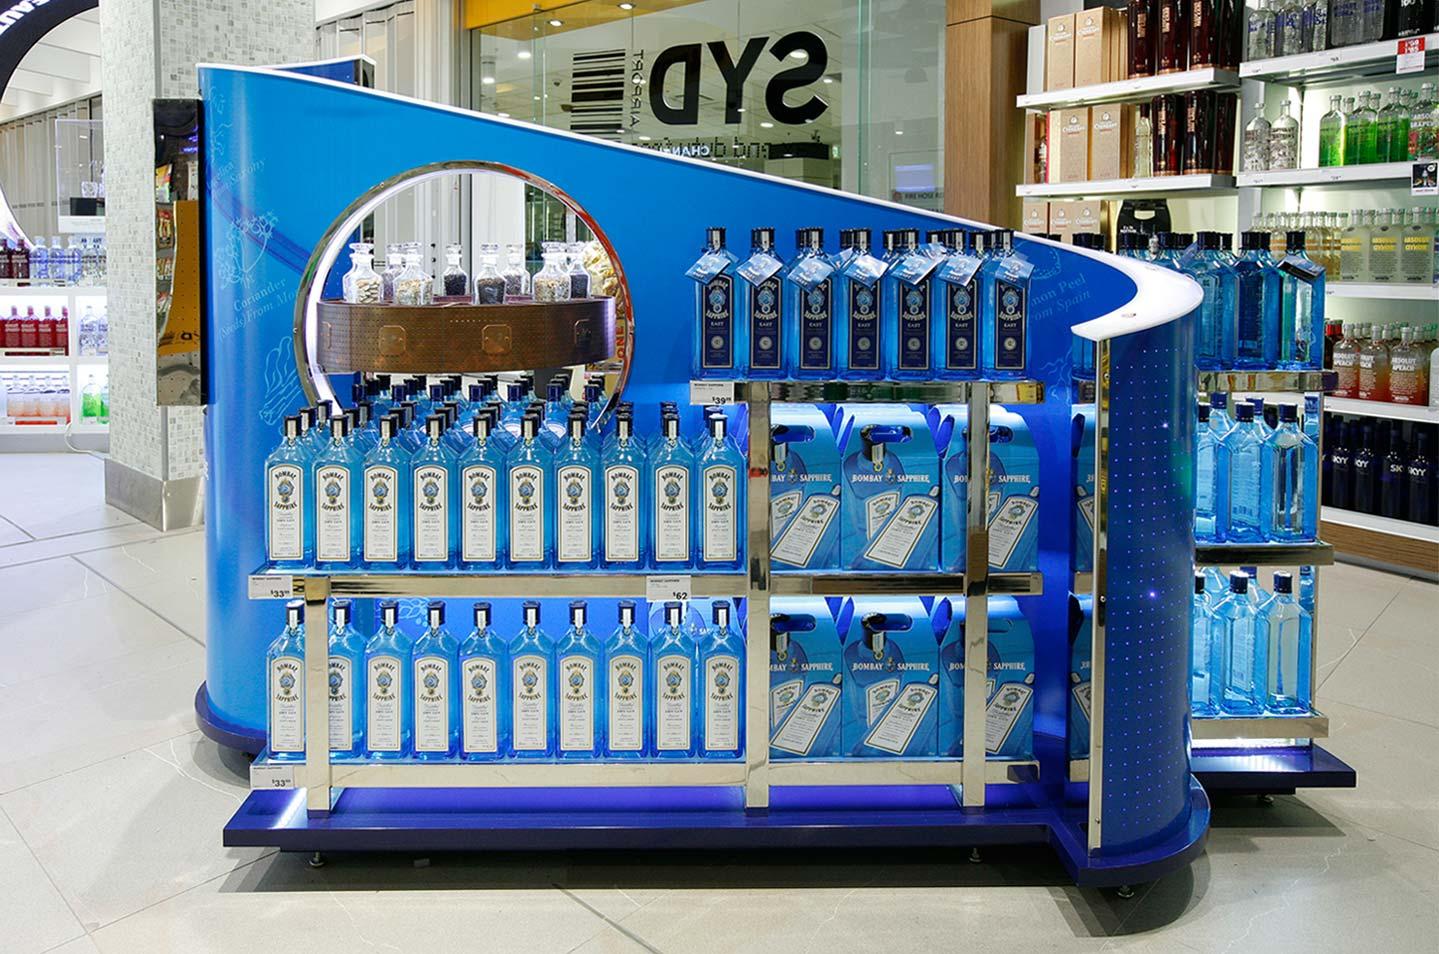 Innovative merchandising display Bombay Sapphire